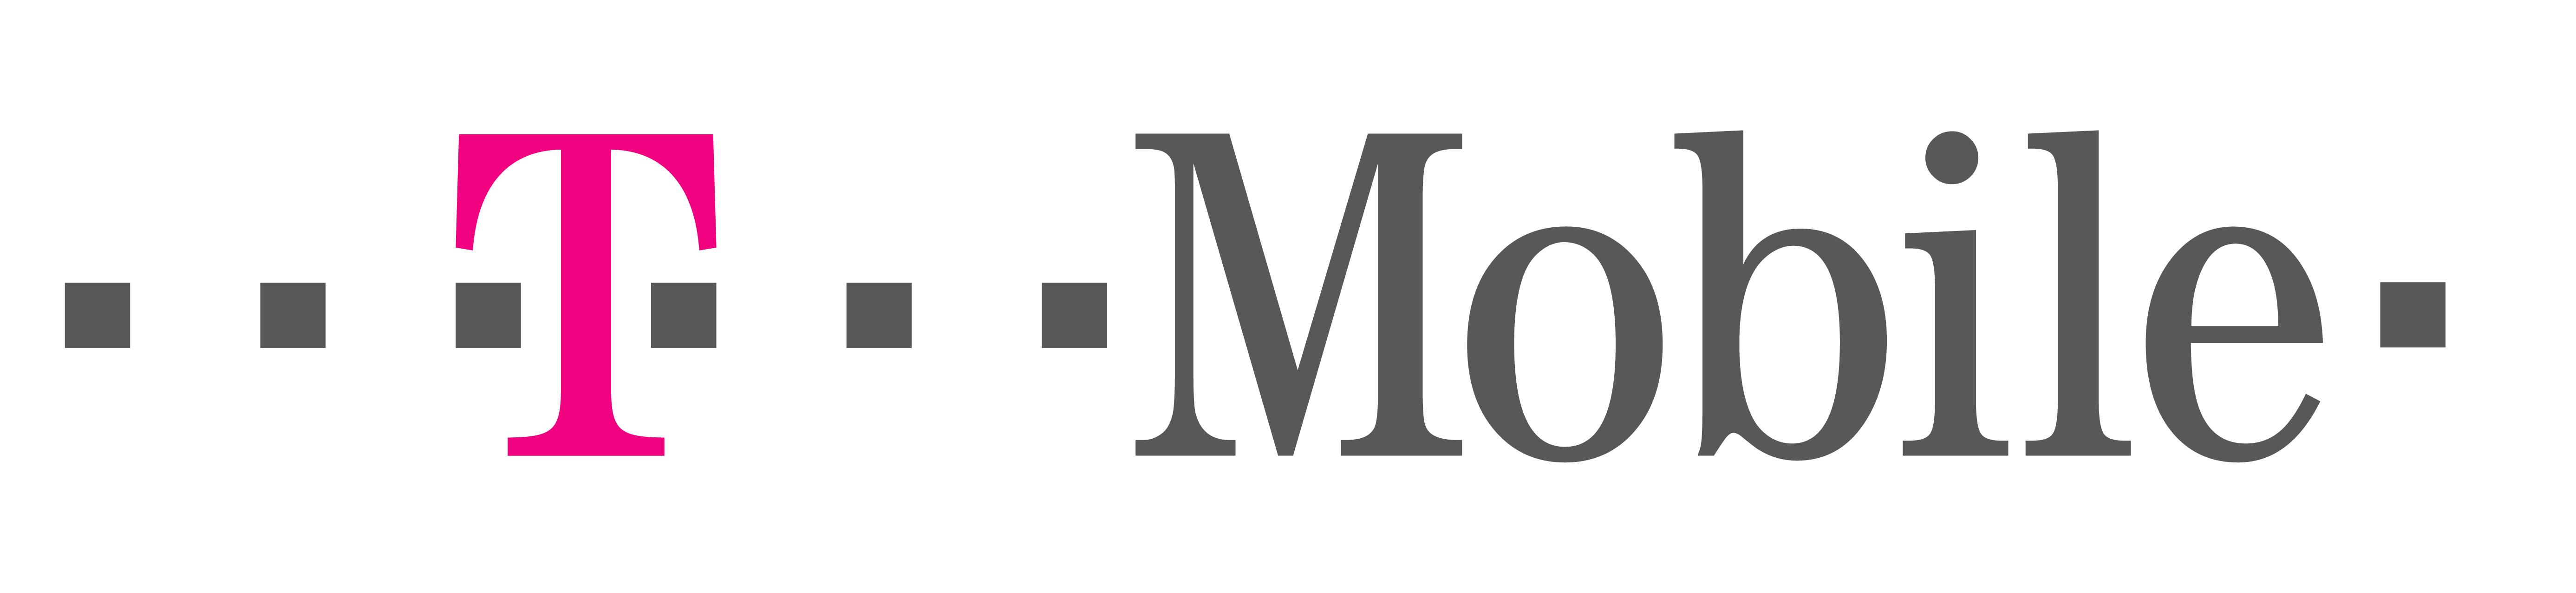 Harbor Mobile - T-Mobile Plans @ $20/line/month Cheaper